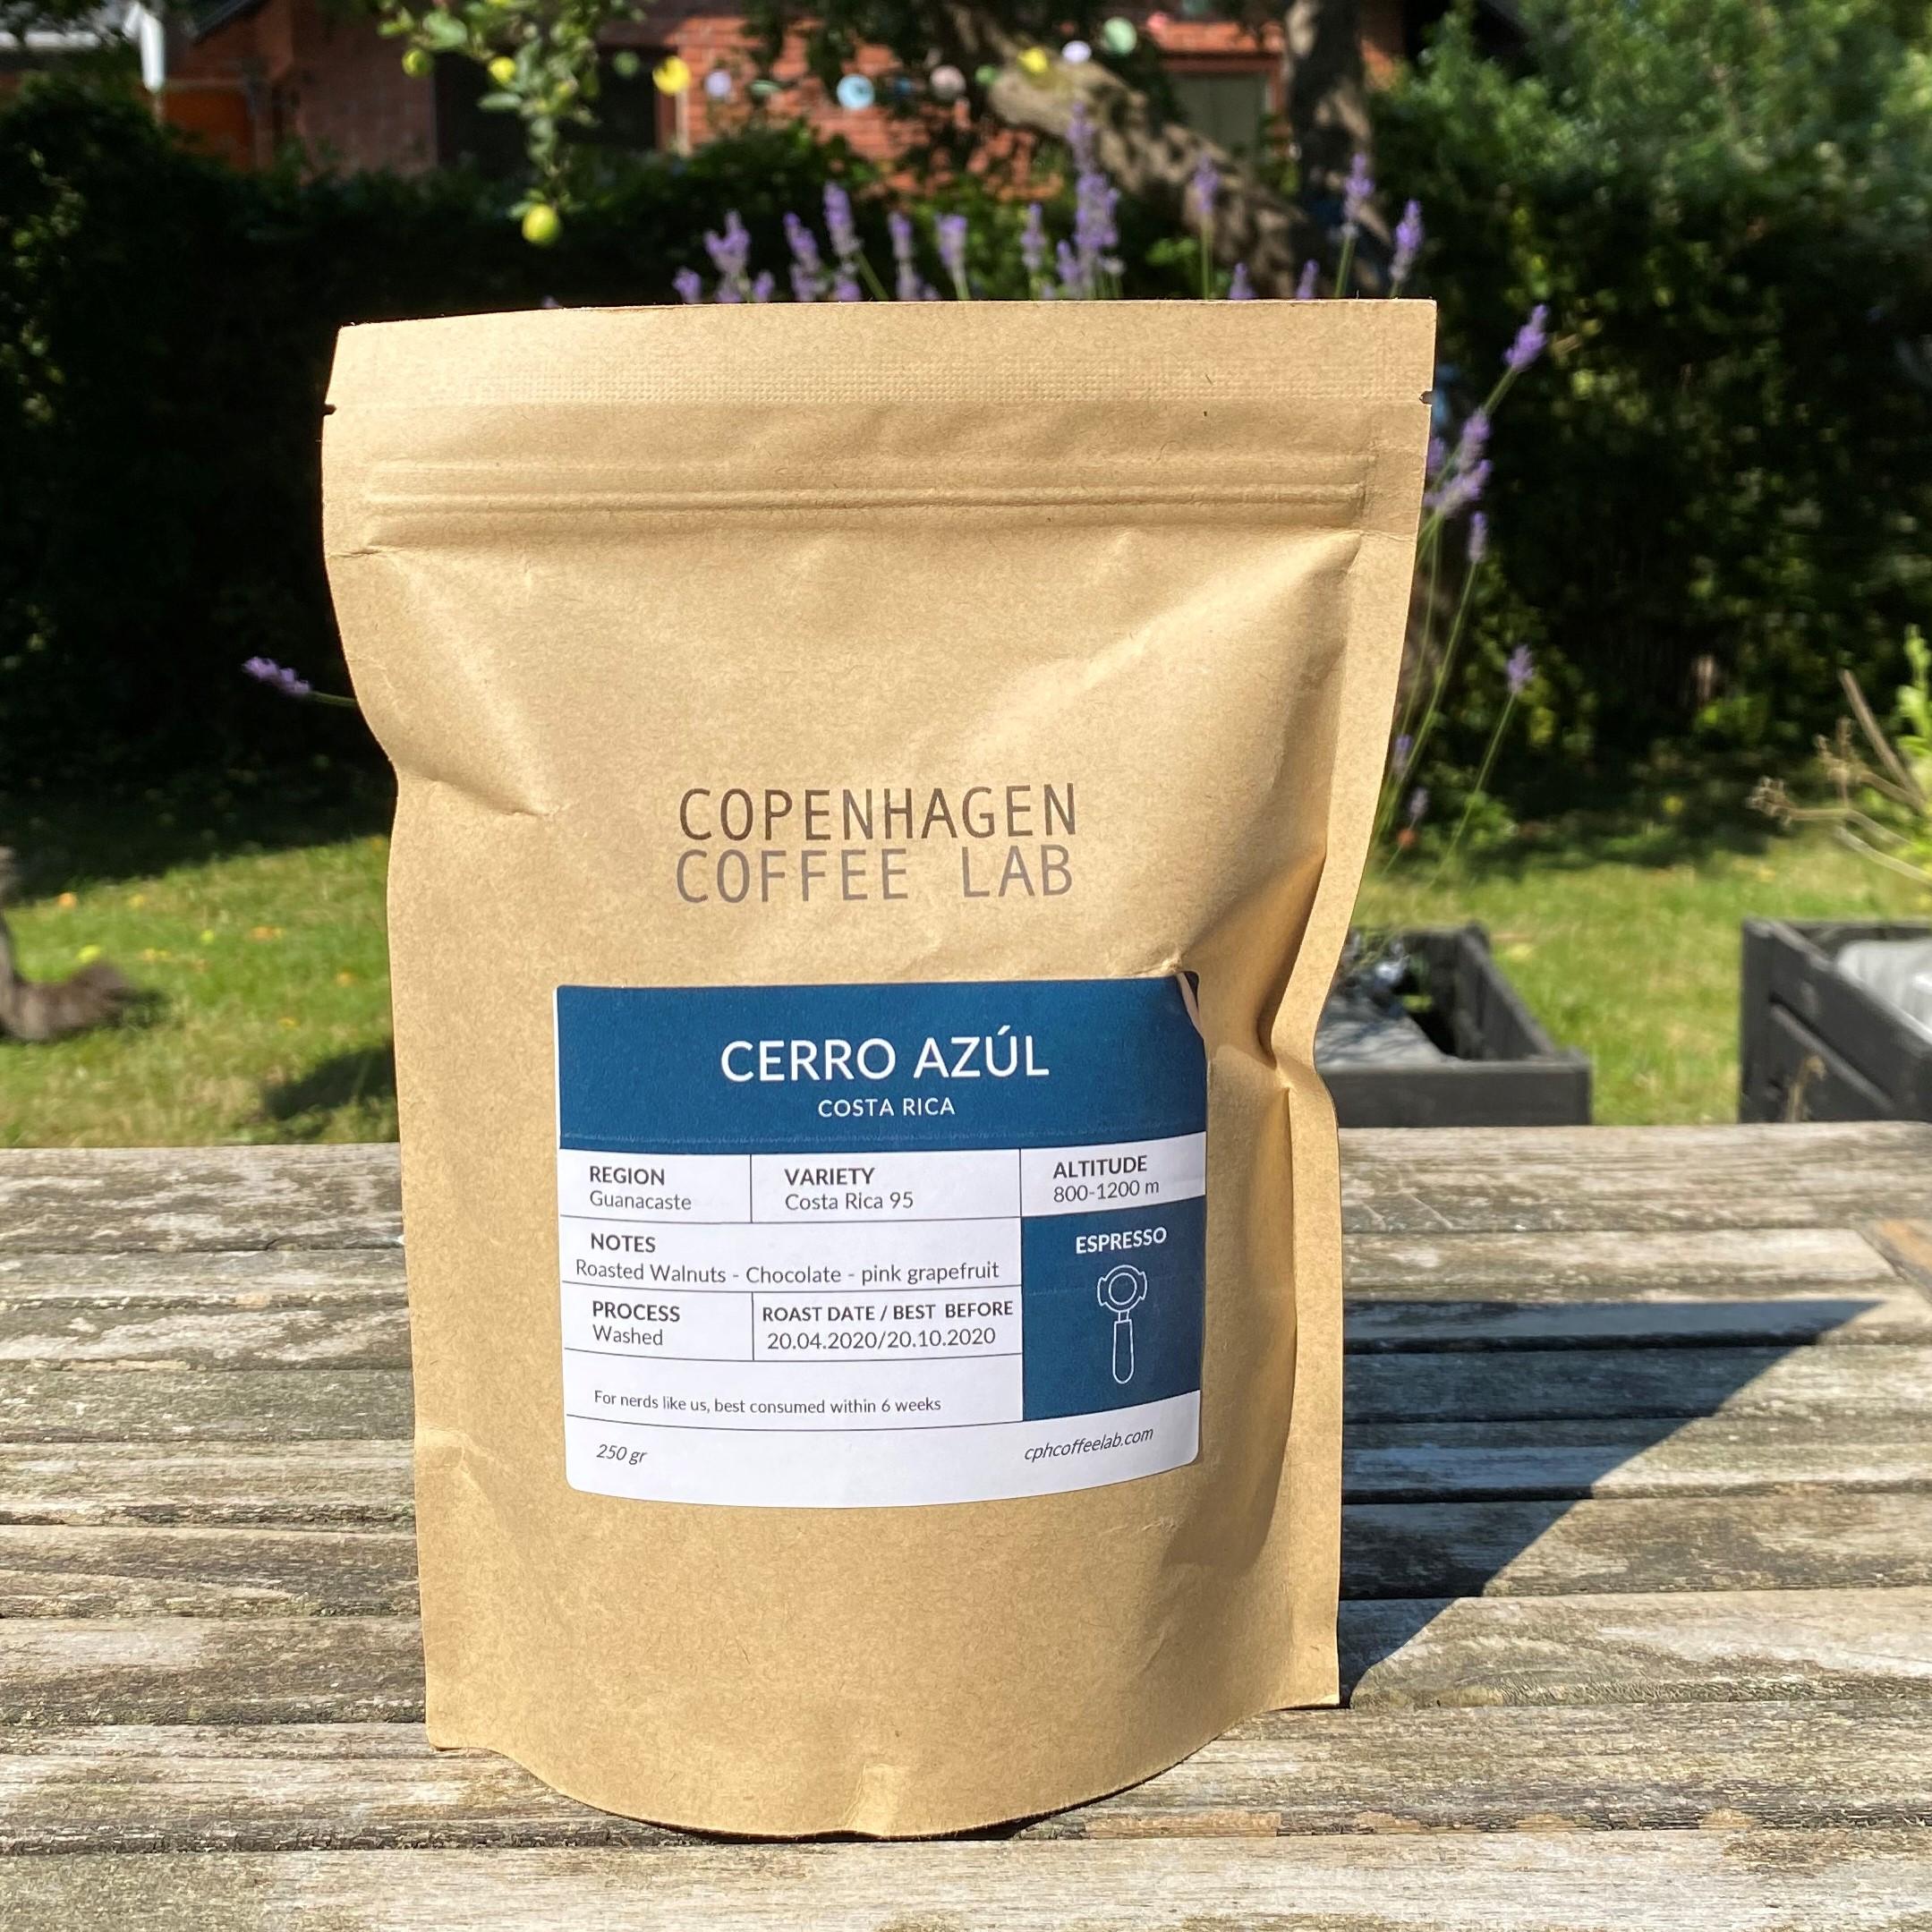 Cph Coffee Lab - Cerro Azúl